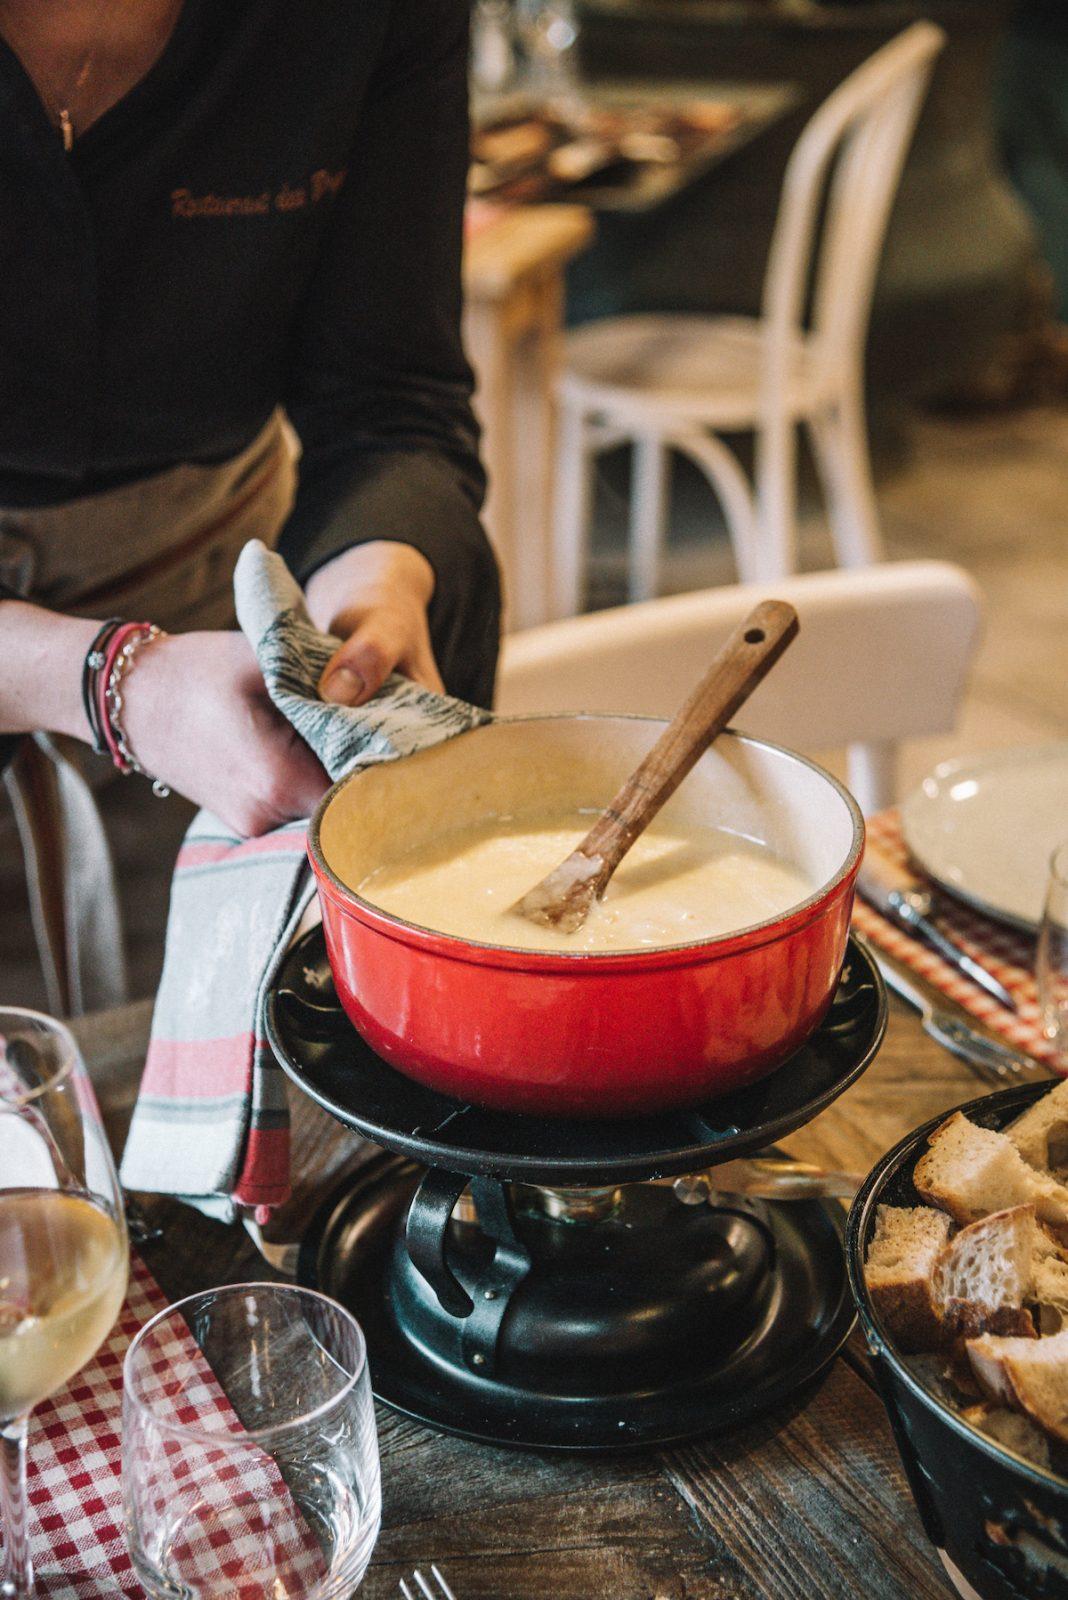 Restaurant des bergers – fondue